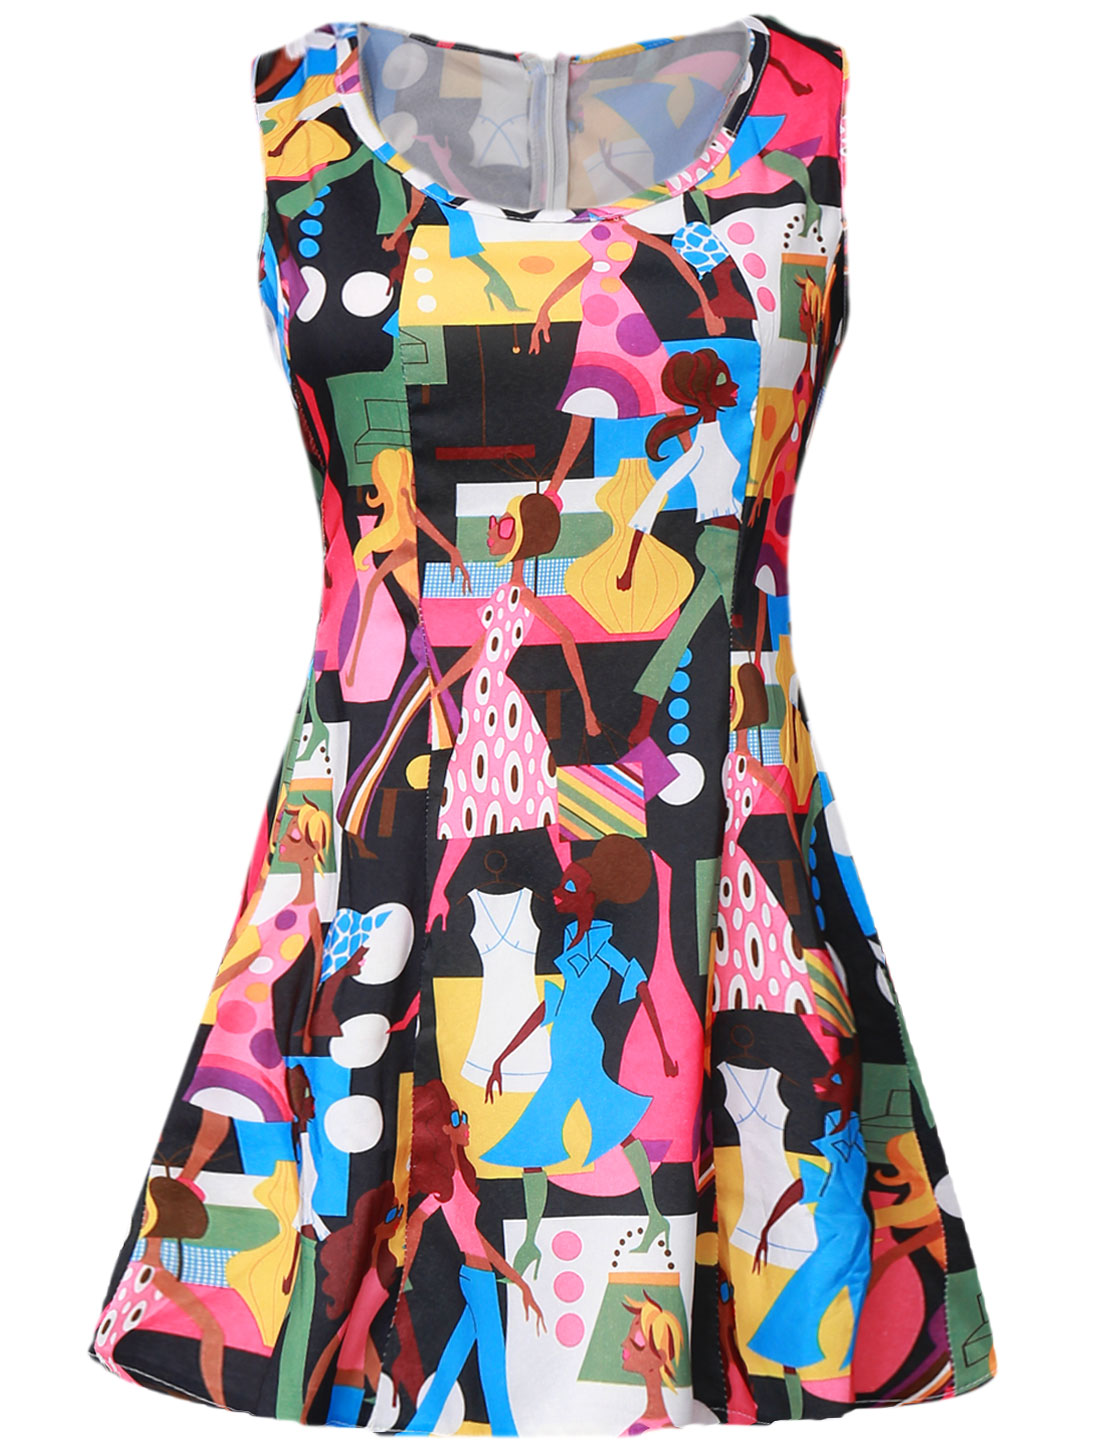 Lady Cartoon Portrait Prints Concealed Zipper Back Skater Dress Black S